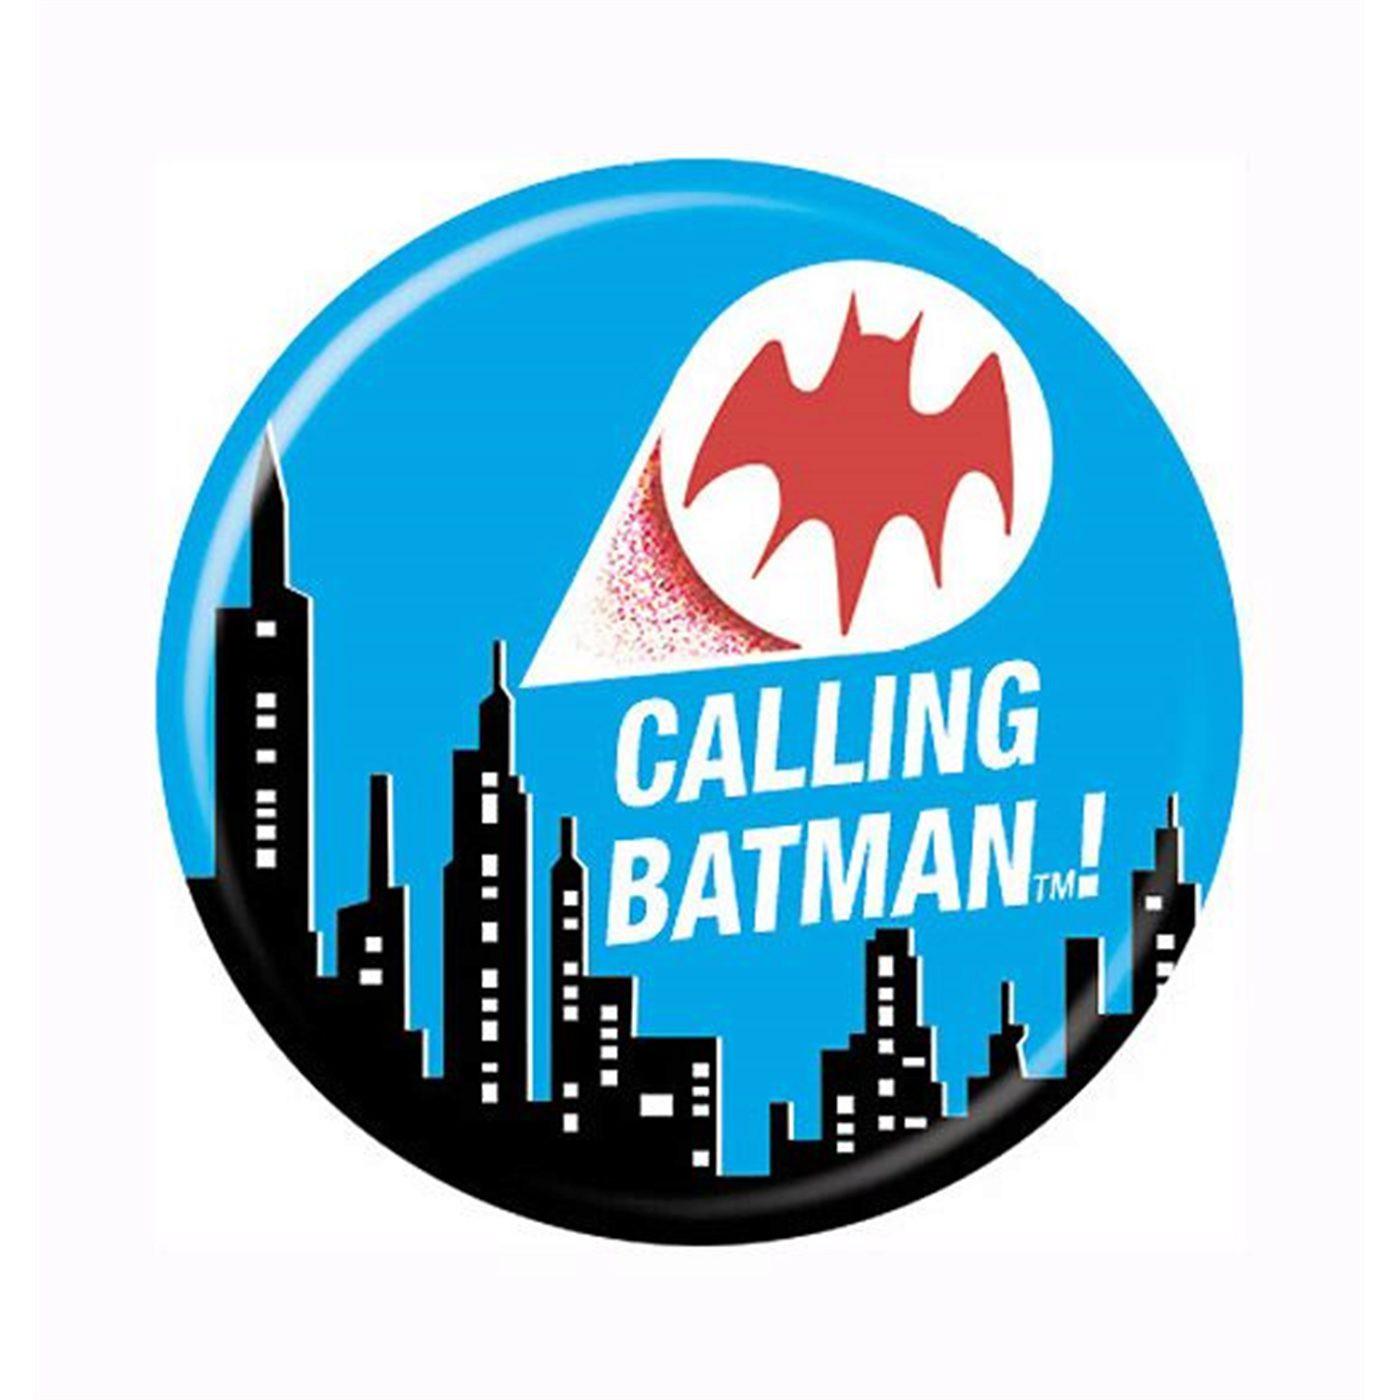 Calling Batman Button